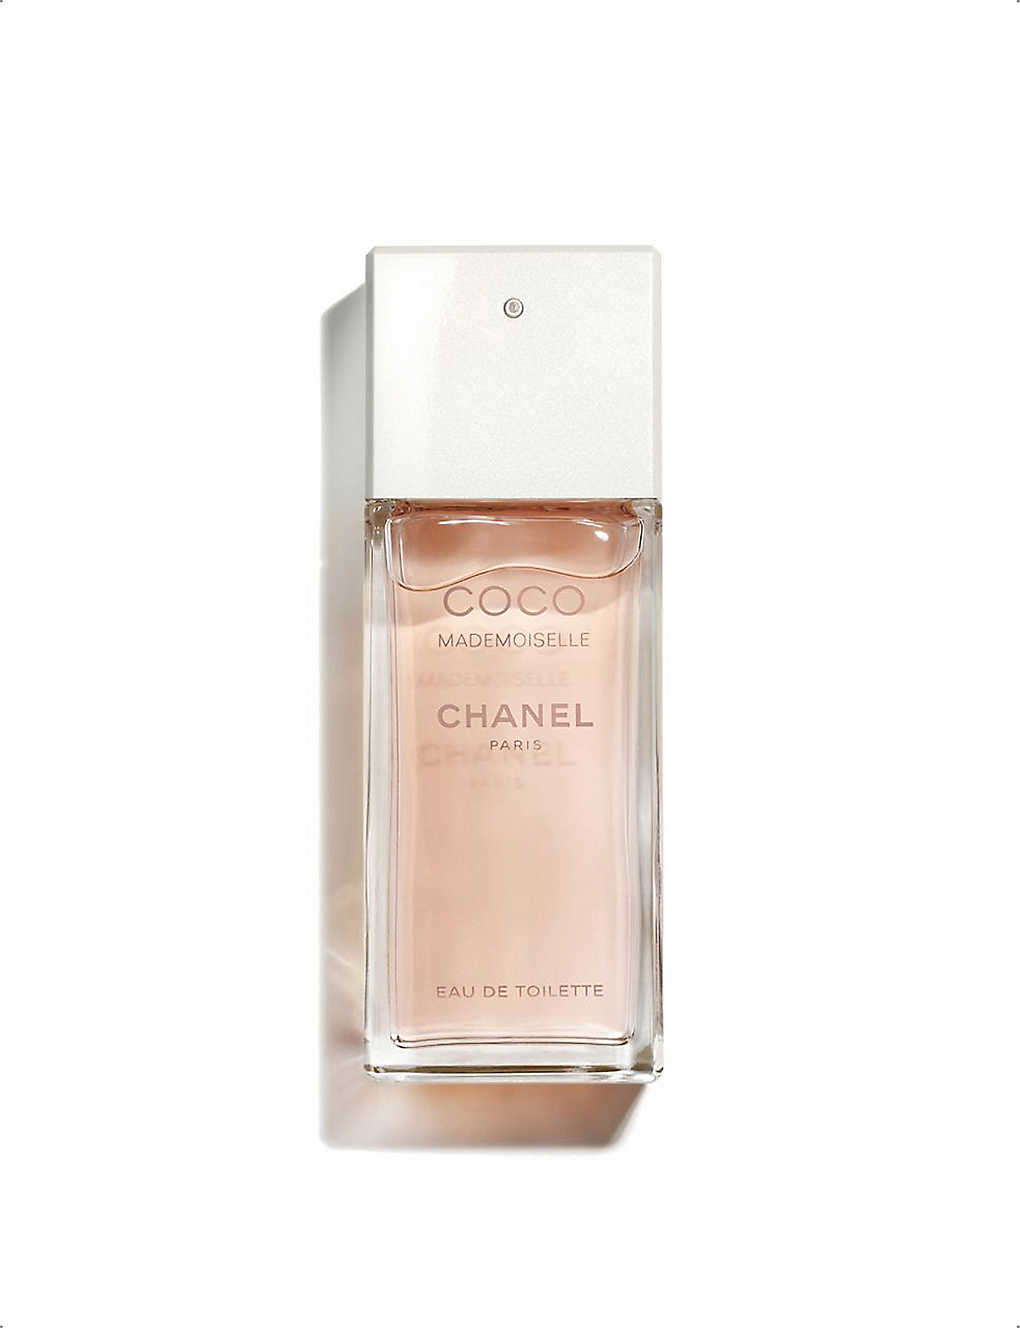 Chanel Coco Mademoiselle Eau De Toilette Spray 50ml Selfridgescom